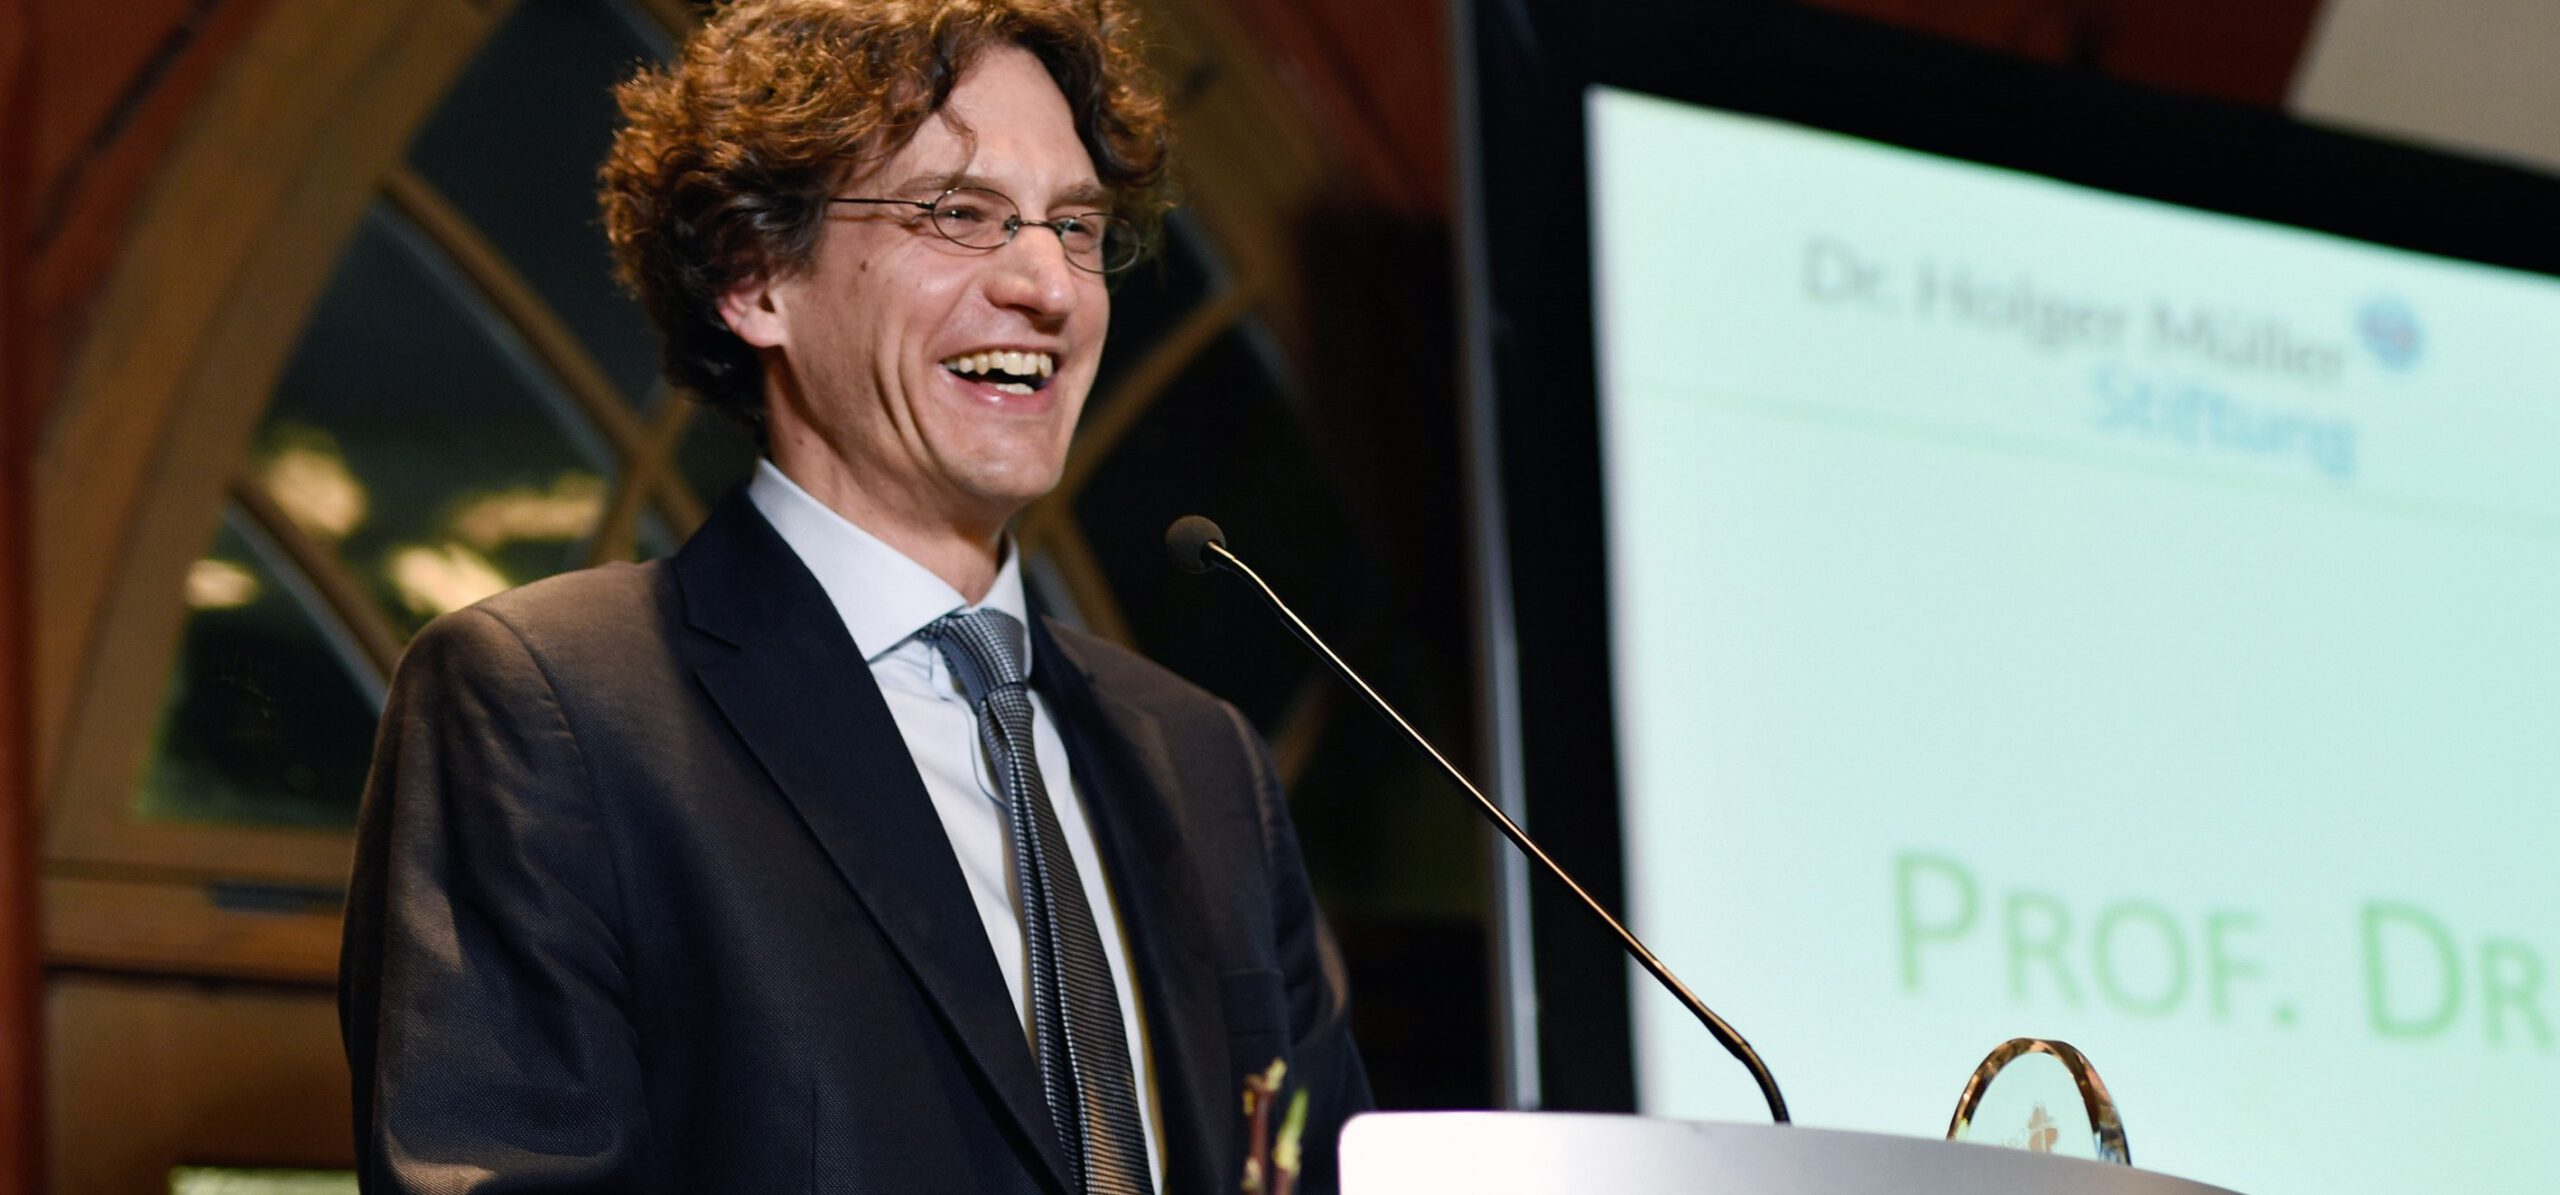 Freiburger Humangenetiker Prof. Carsten Bergmann erhält Dr. Holger Müller Preis 2017